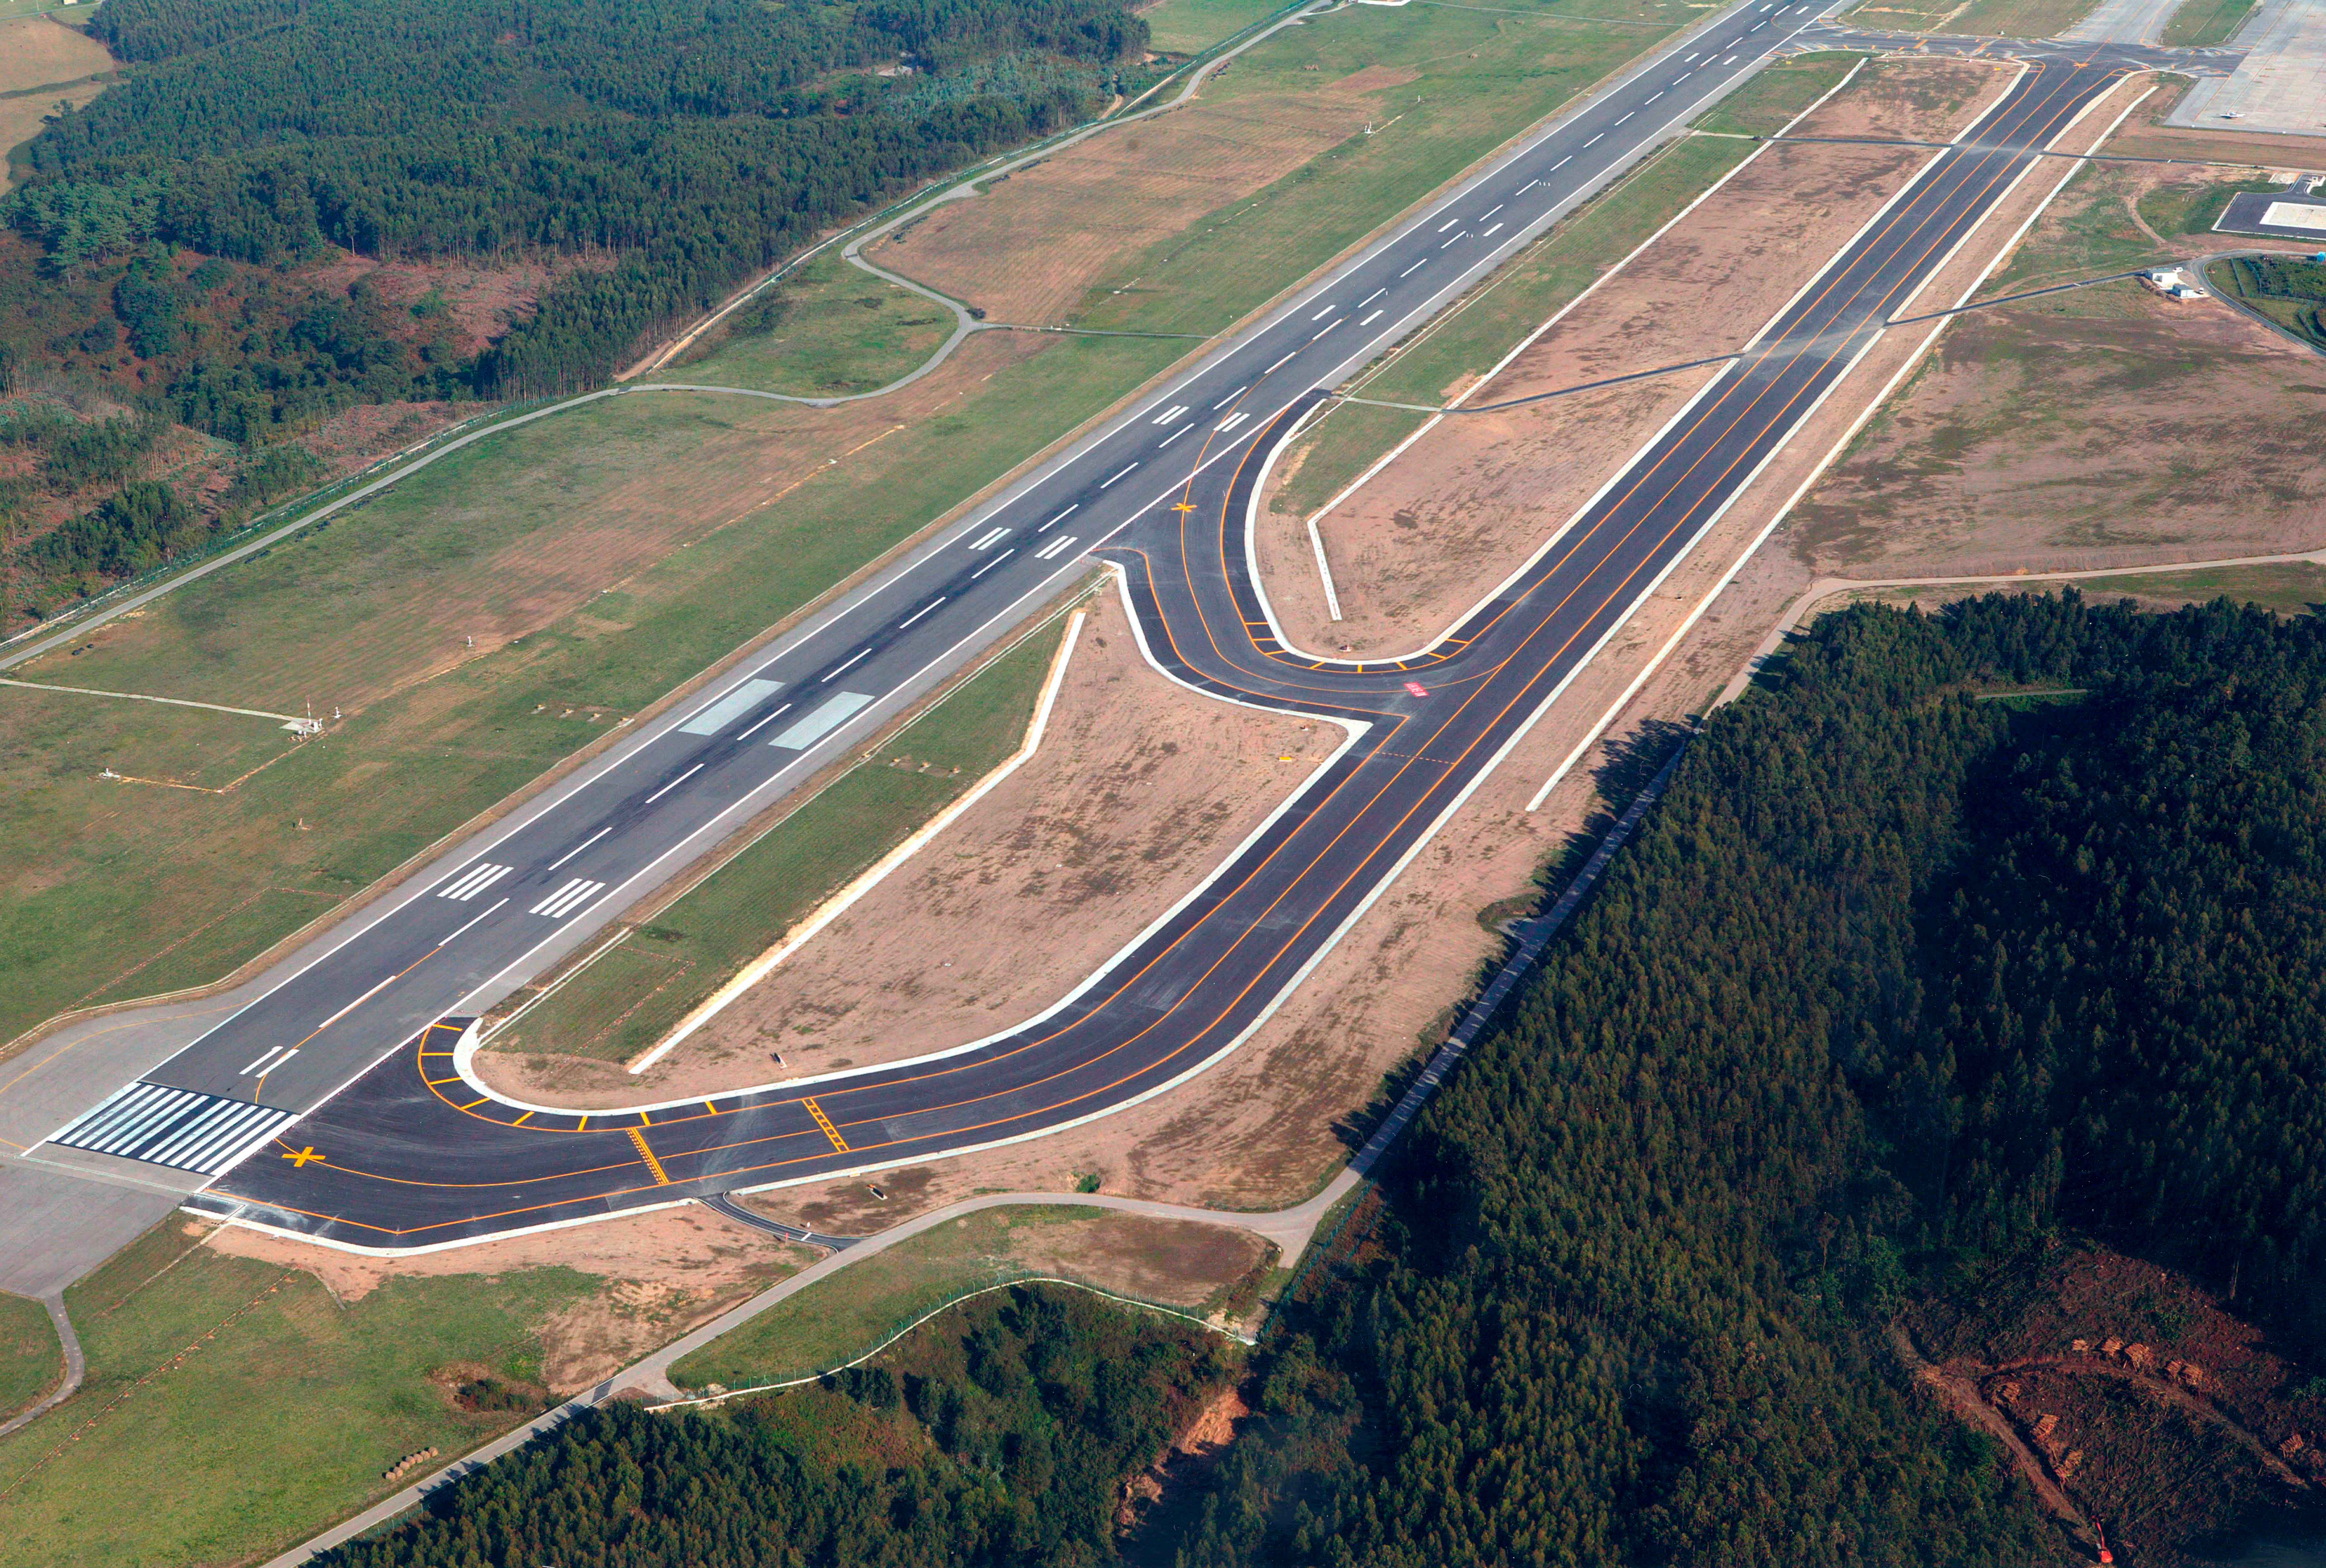 Aeropuerto Asturias Rodadura vista aerea